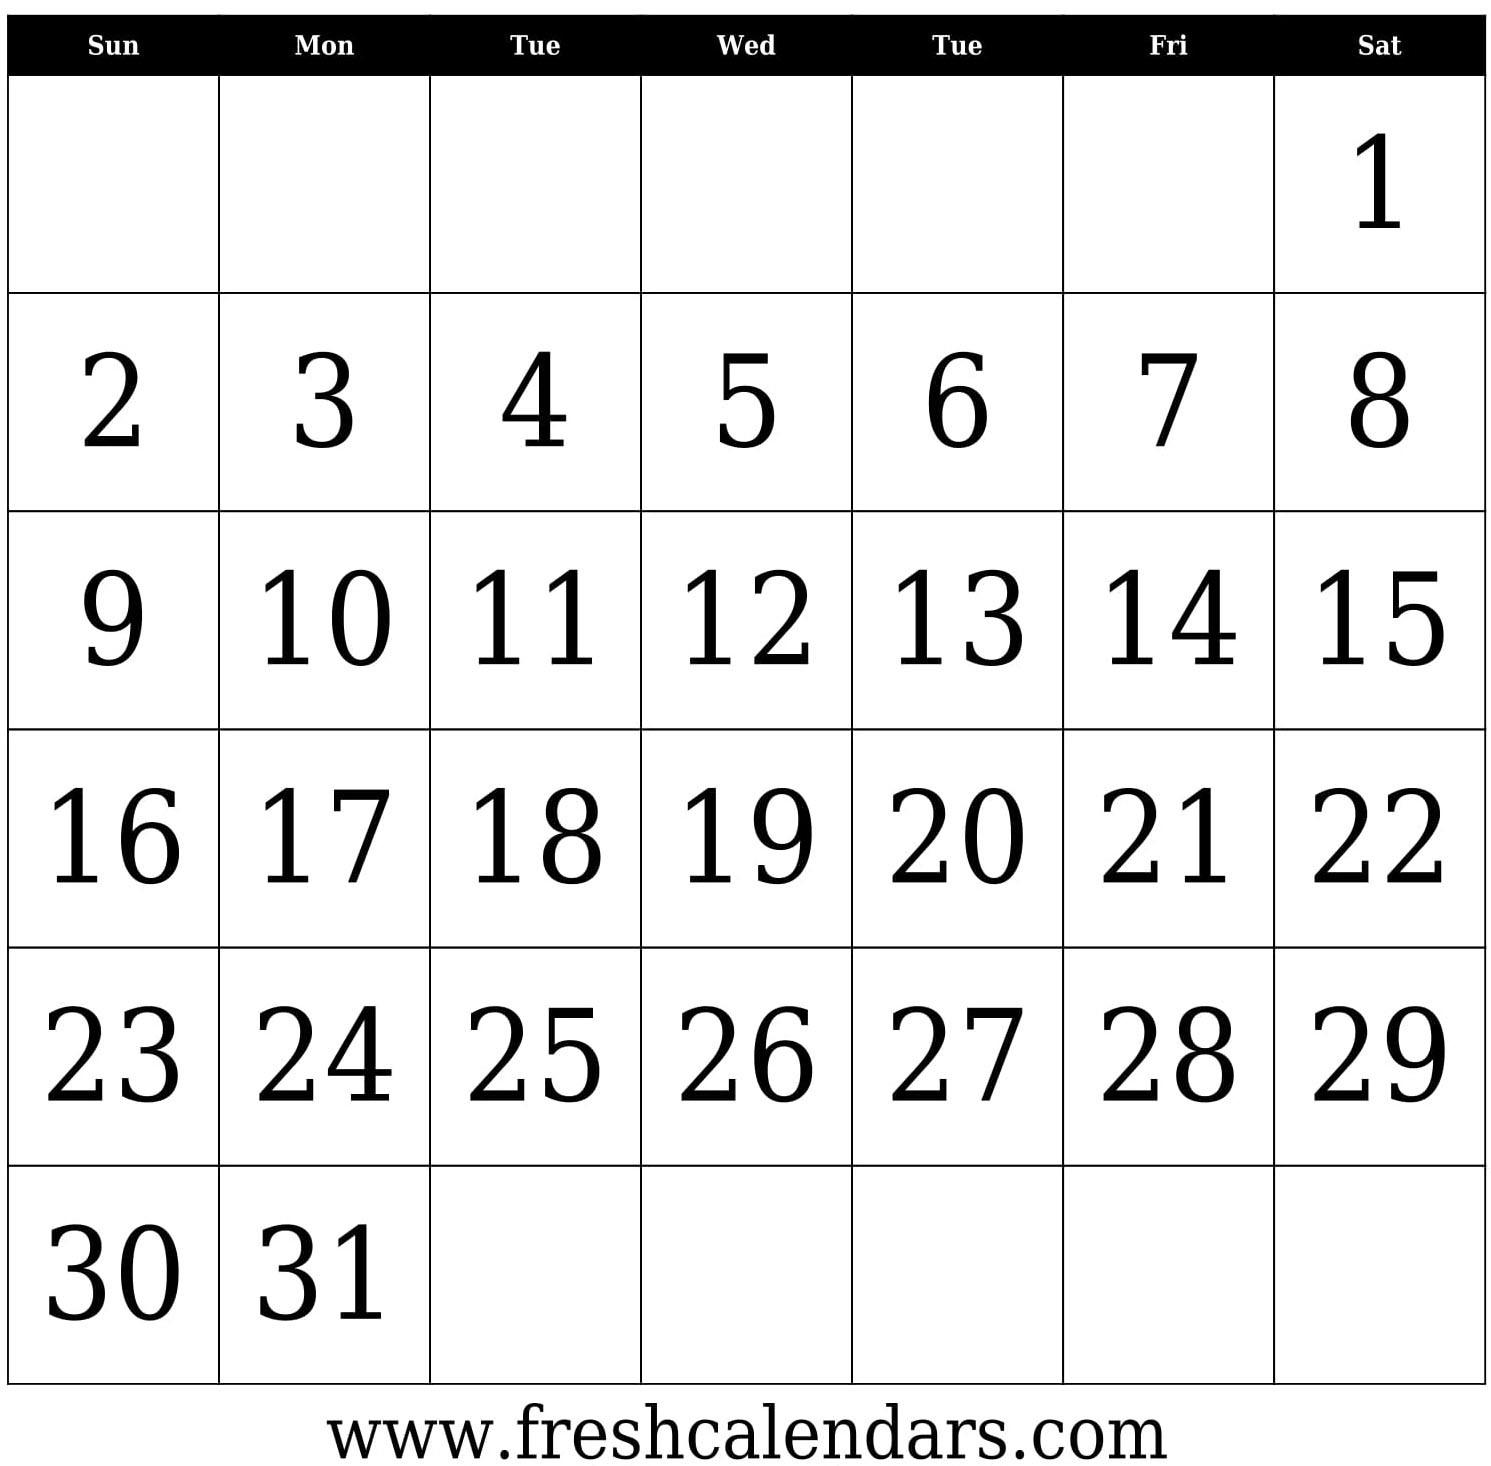 31 Days Blank Calendar Template Bold In To Edit | Thekpark